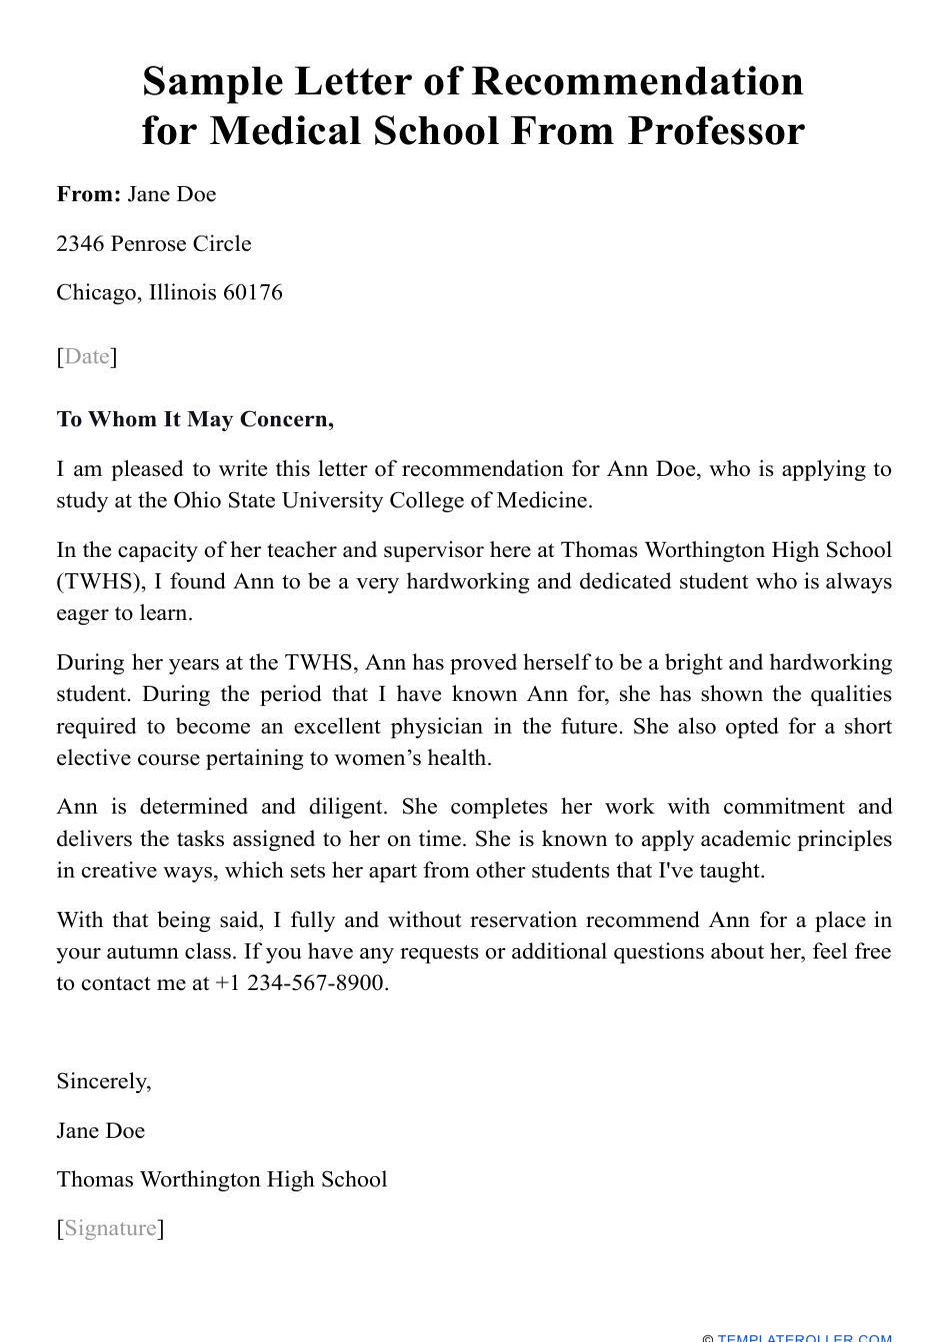 Sample Letter Of Recommendation For